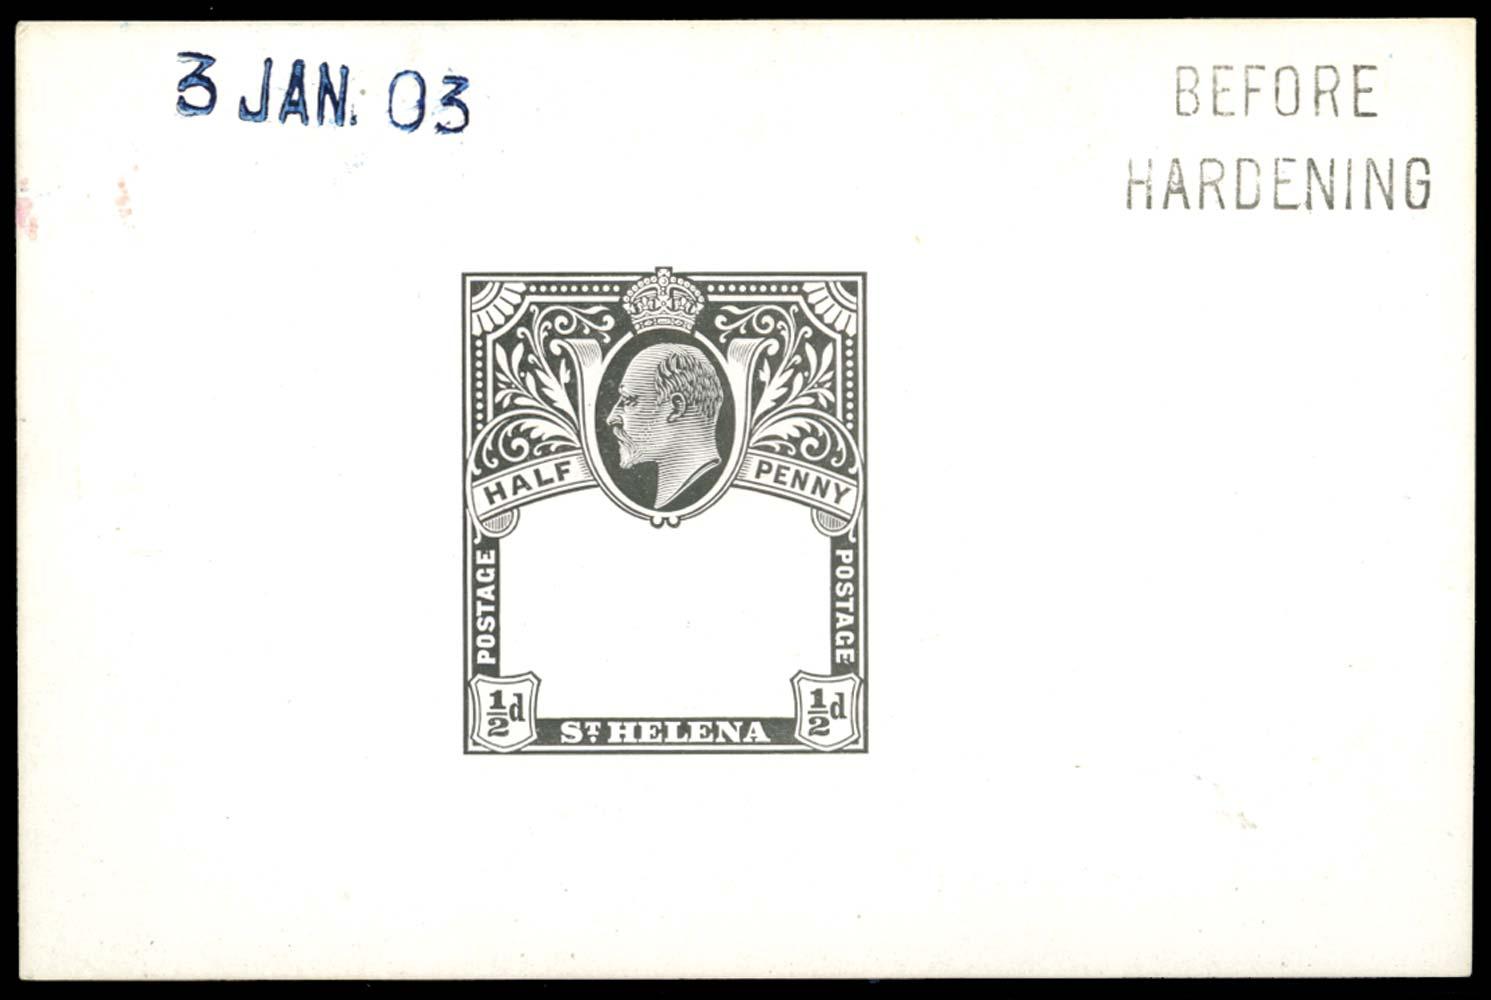 ST HELENA 1903  SG55 Proof